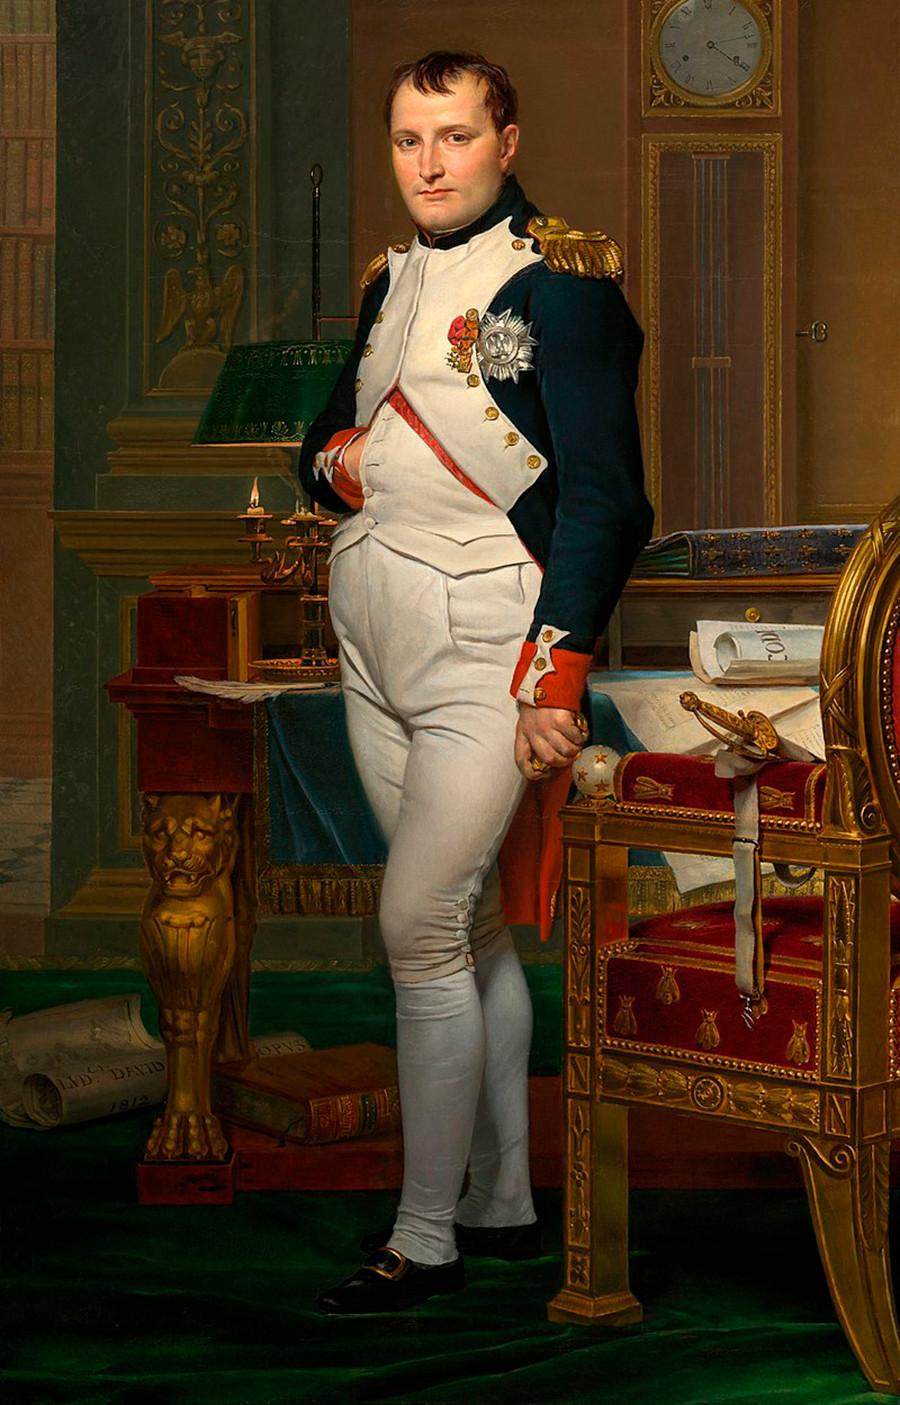 Porträt von Kaiser Napoleon Bonaparte